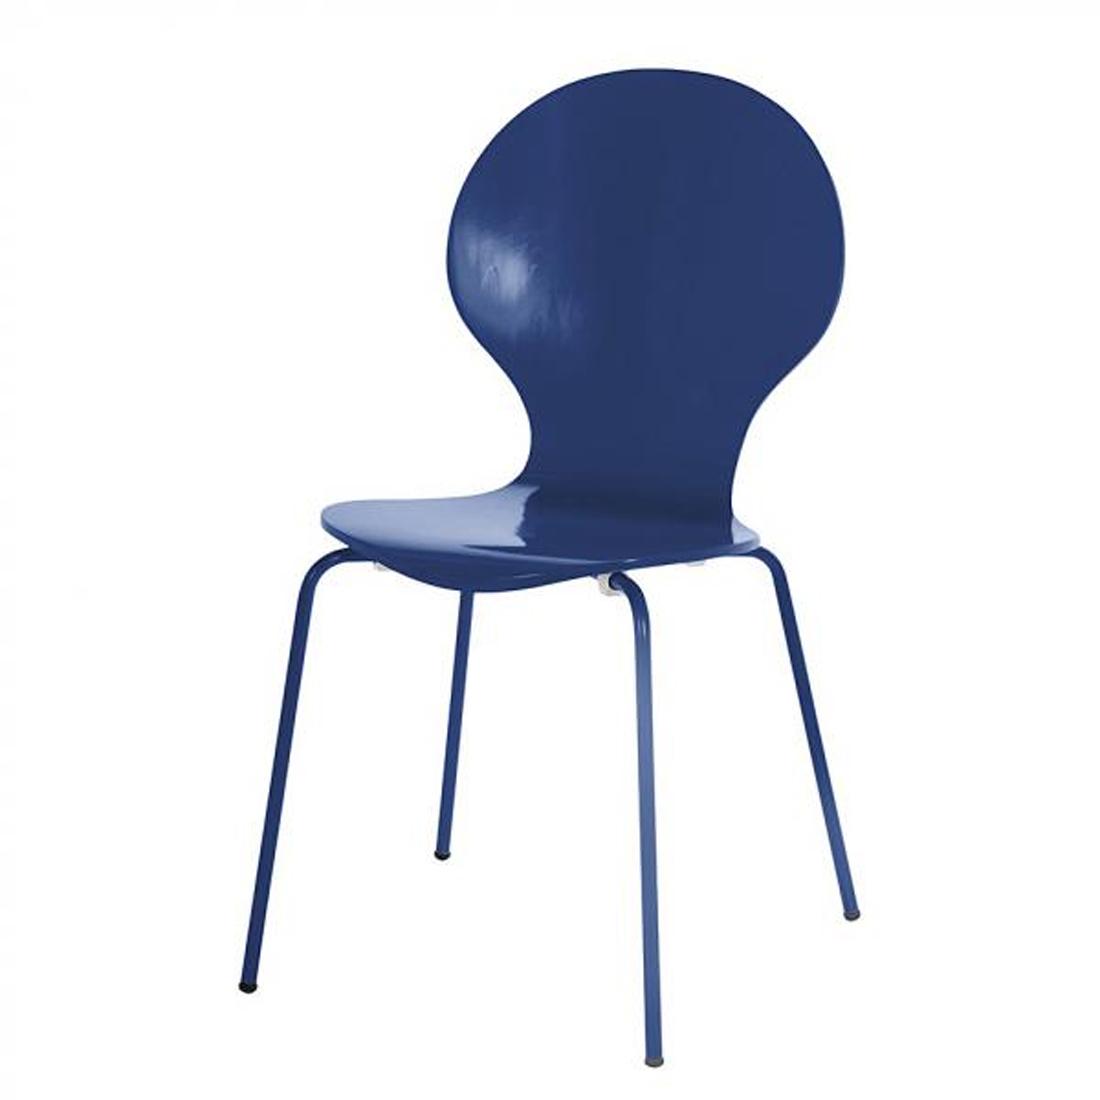 2x Esszimmer Stuhl Holzstuhl Stuhlset Holz Küchenstuhl stapelbar ...